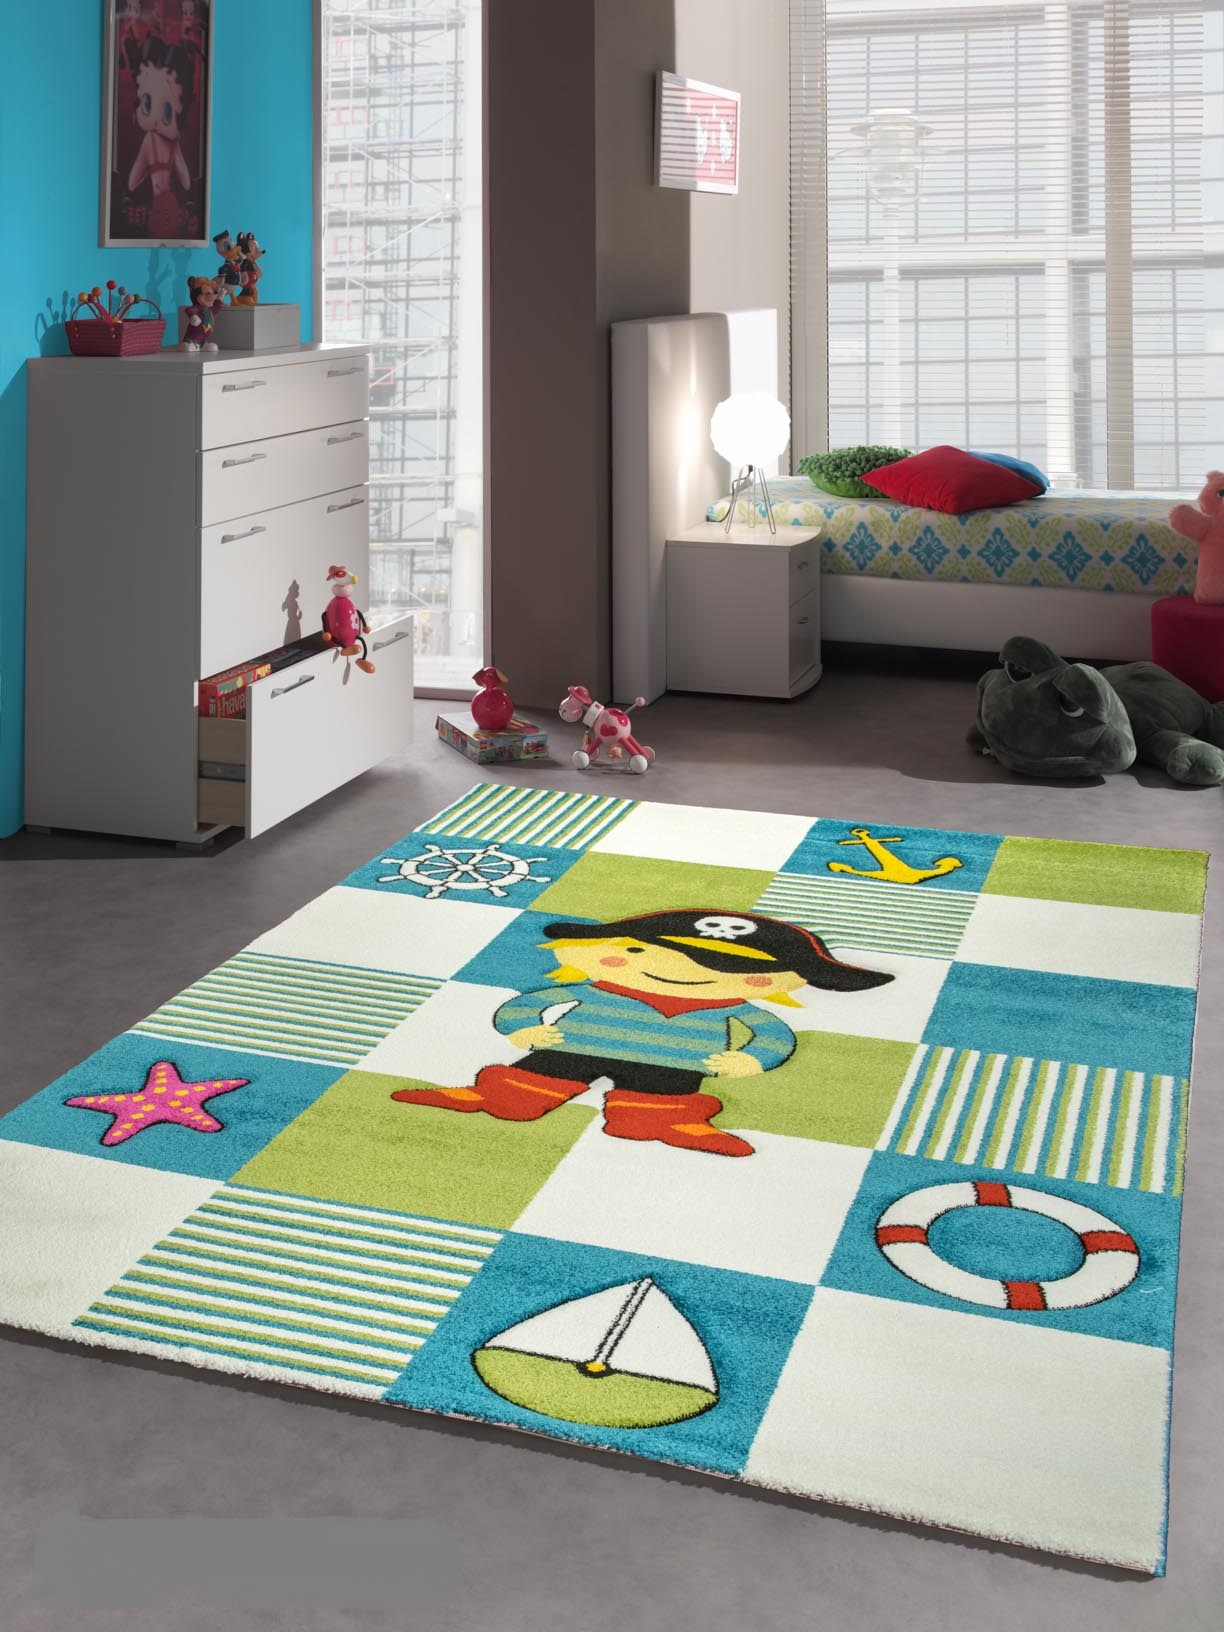 Hem produkter mattor barnmattor piraten barnmatta images frompo - Tapis enfant turquoise ...